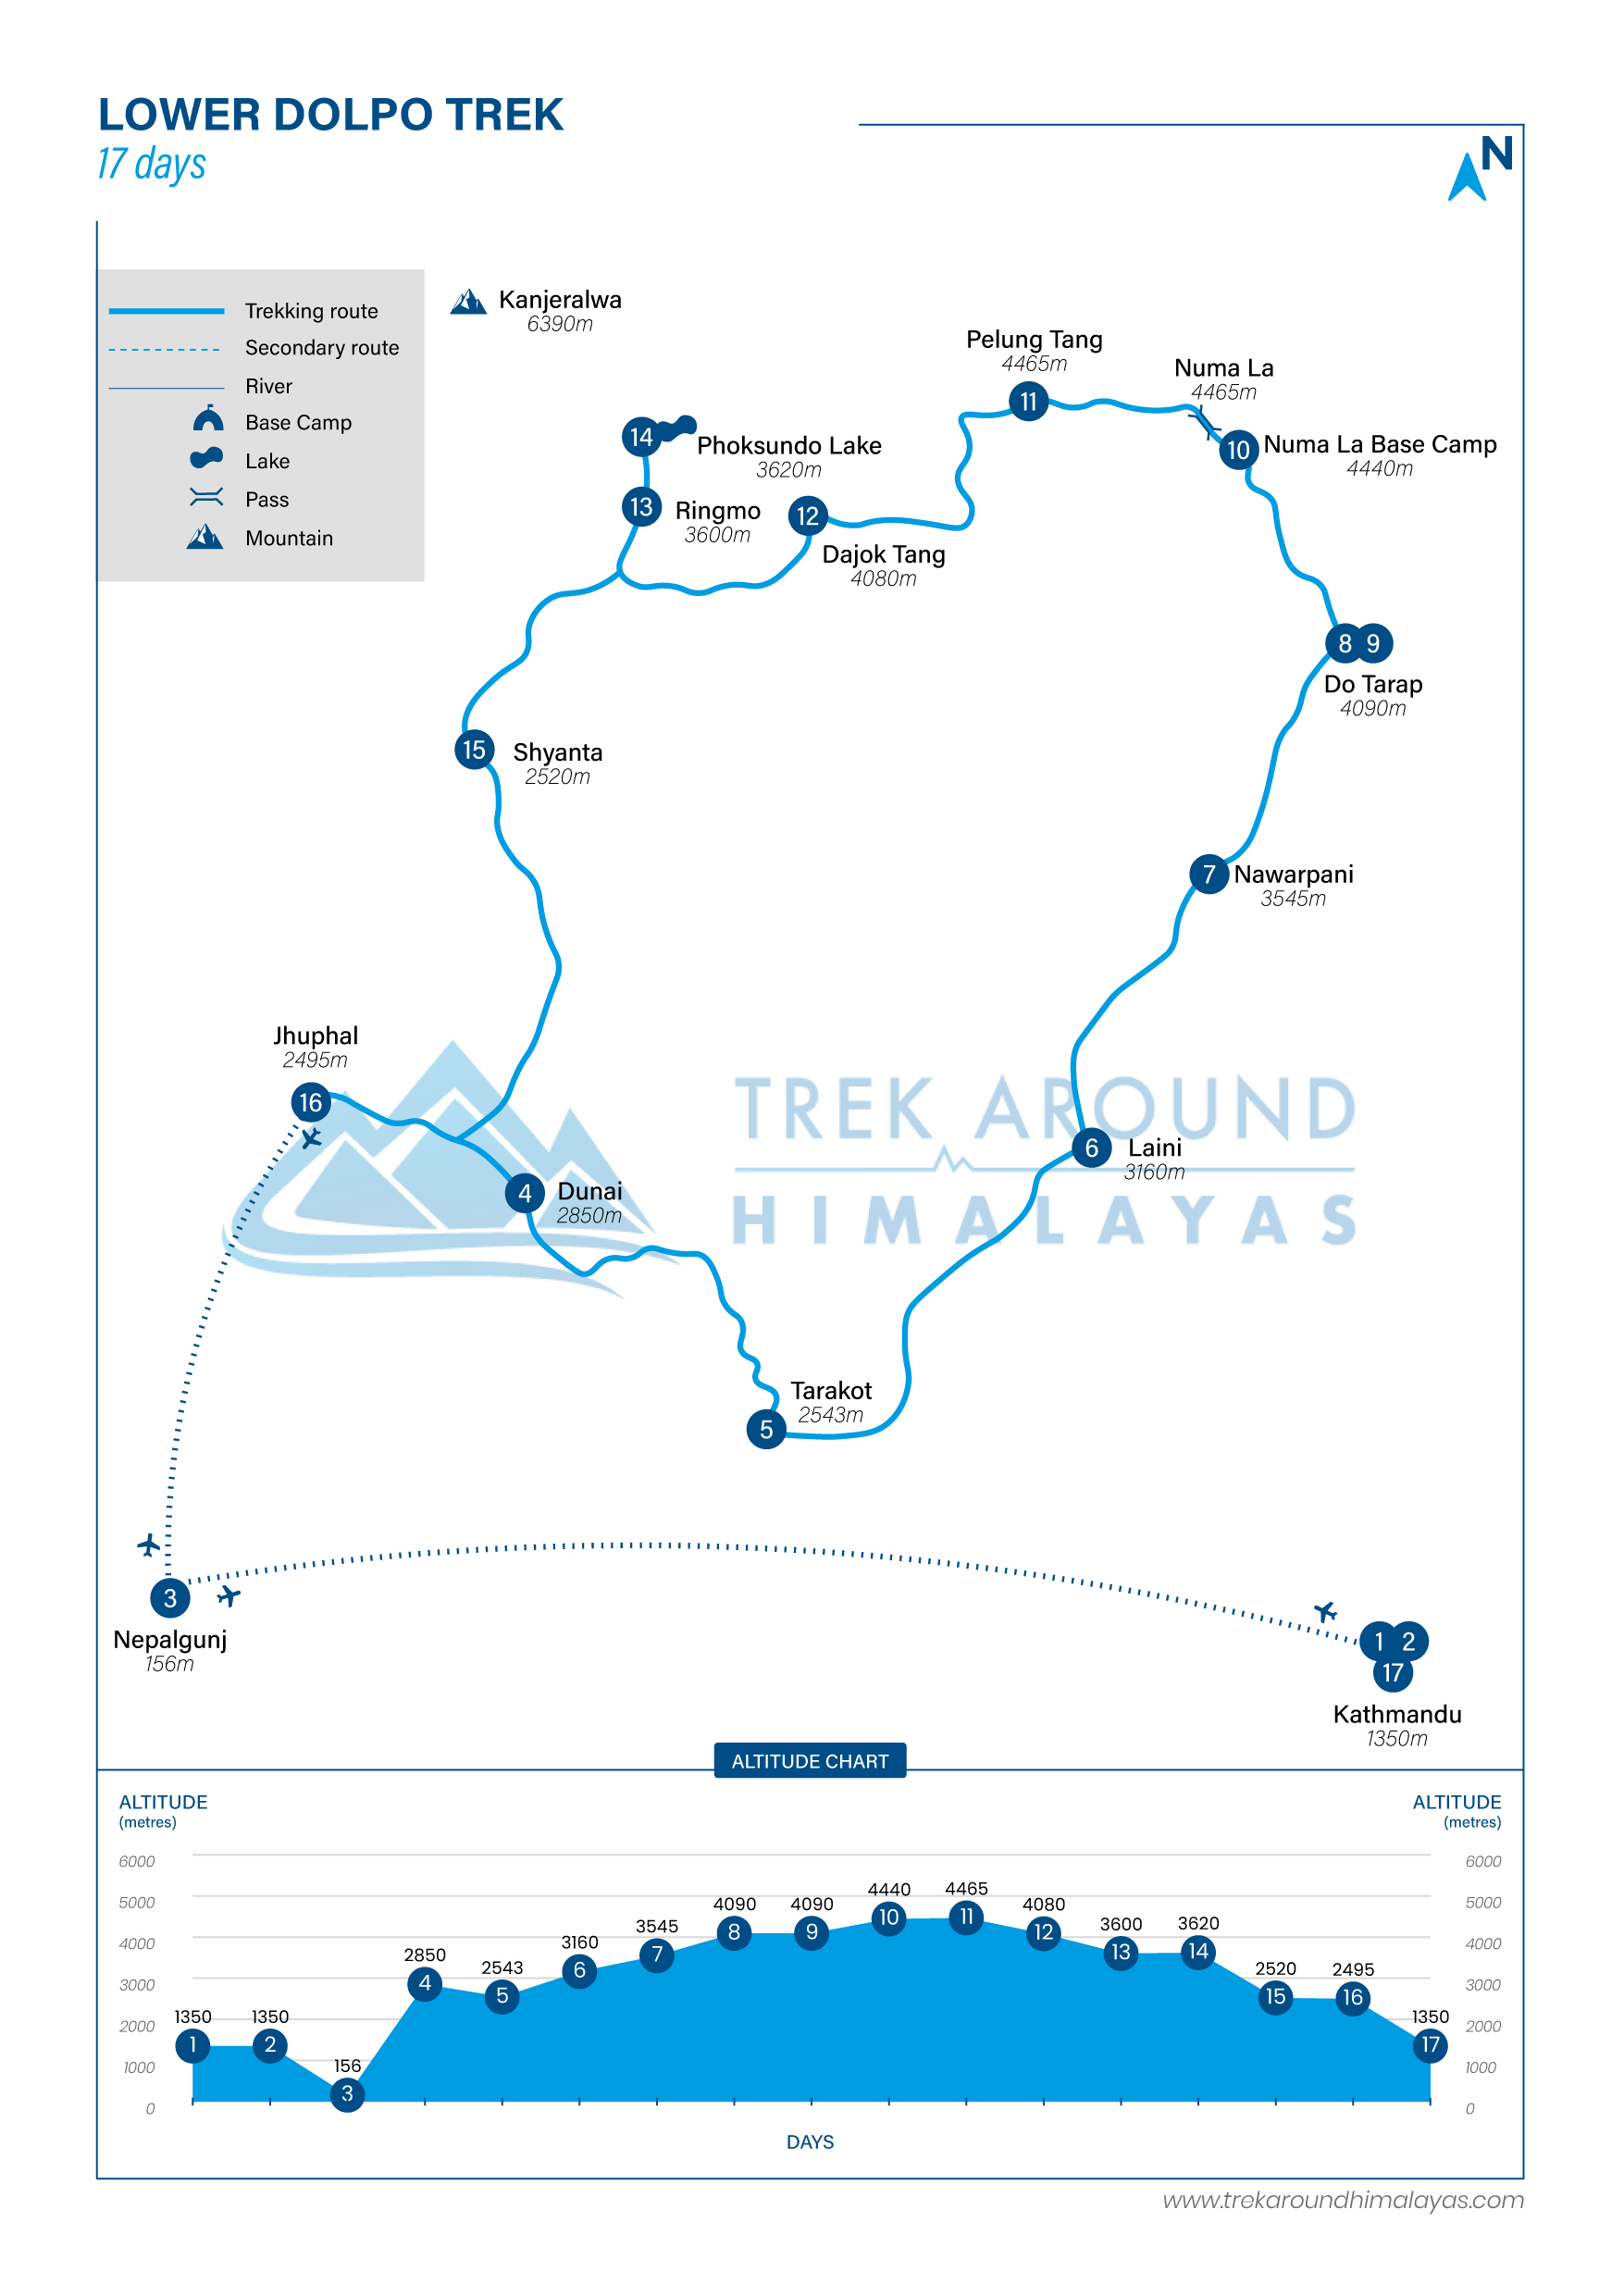 Route Map for Lower Dolpo Trek | Adventure Altitude